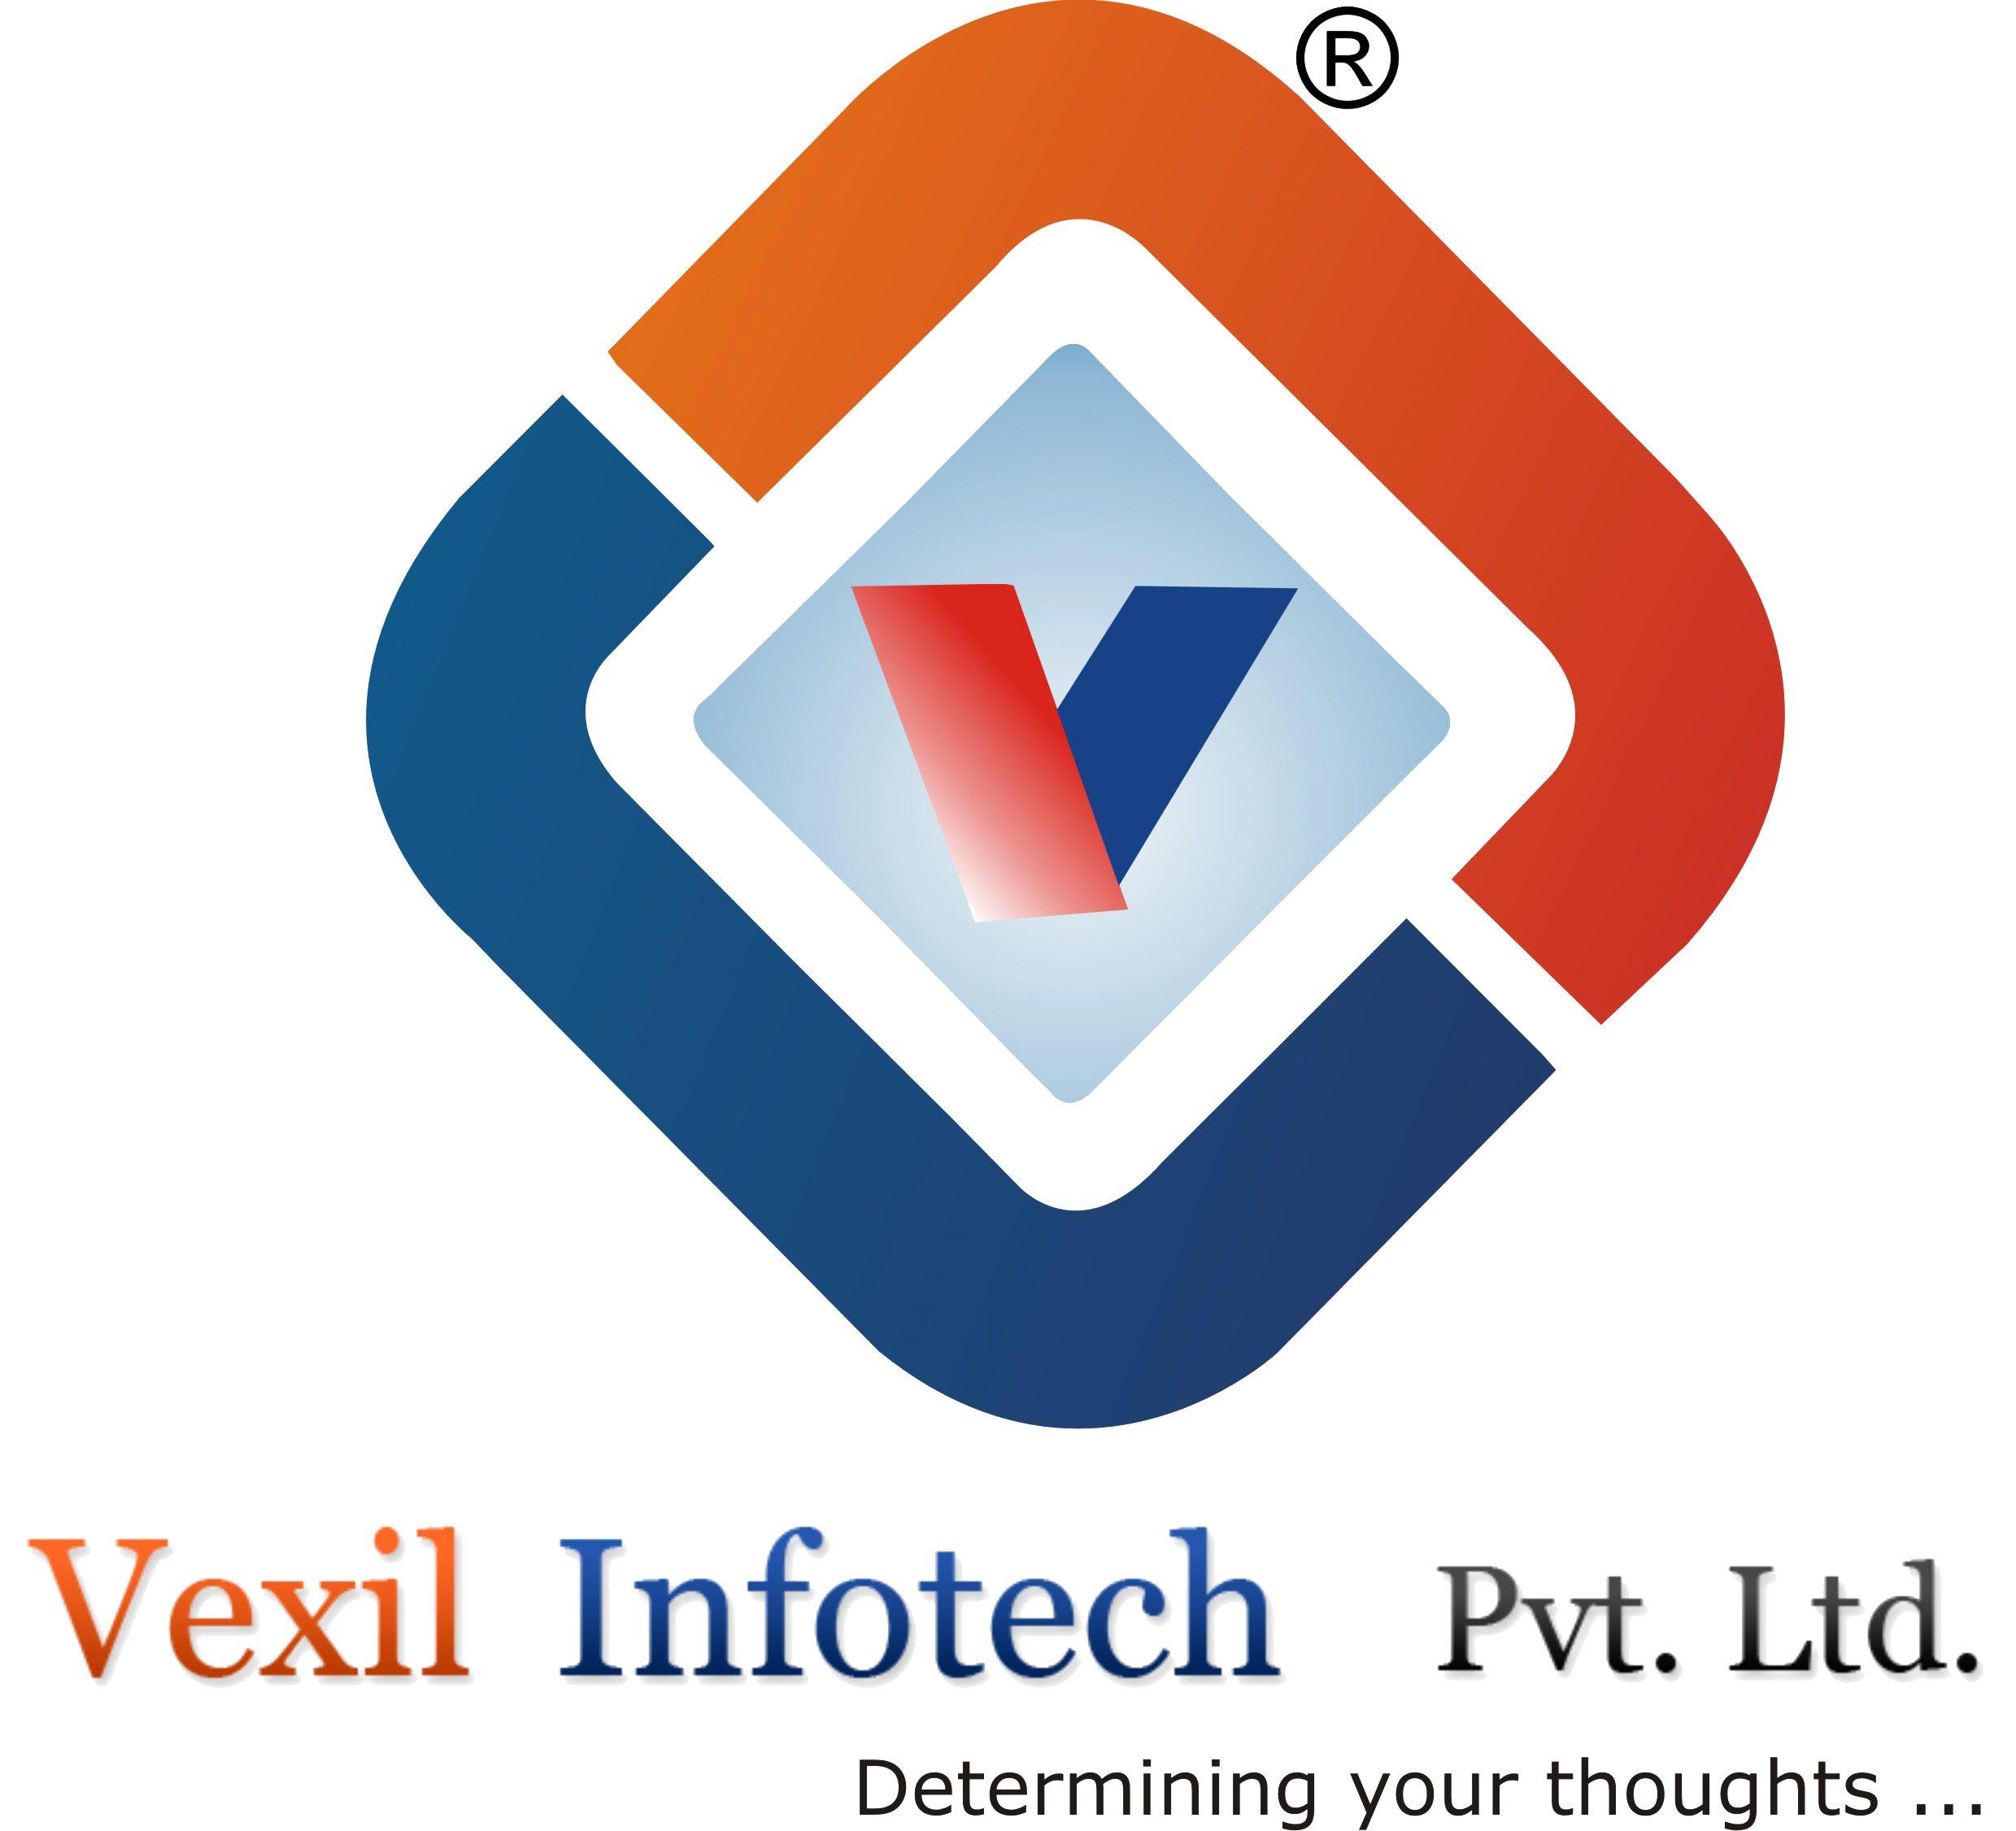 Vexil Infotech Pvt.Ltd